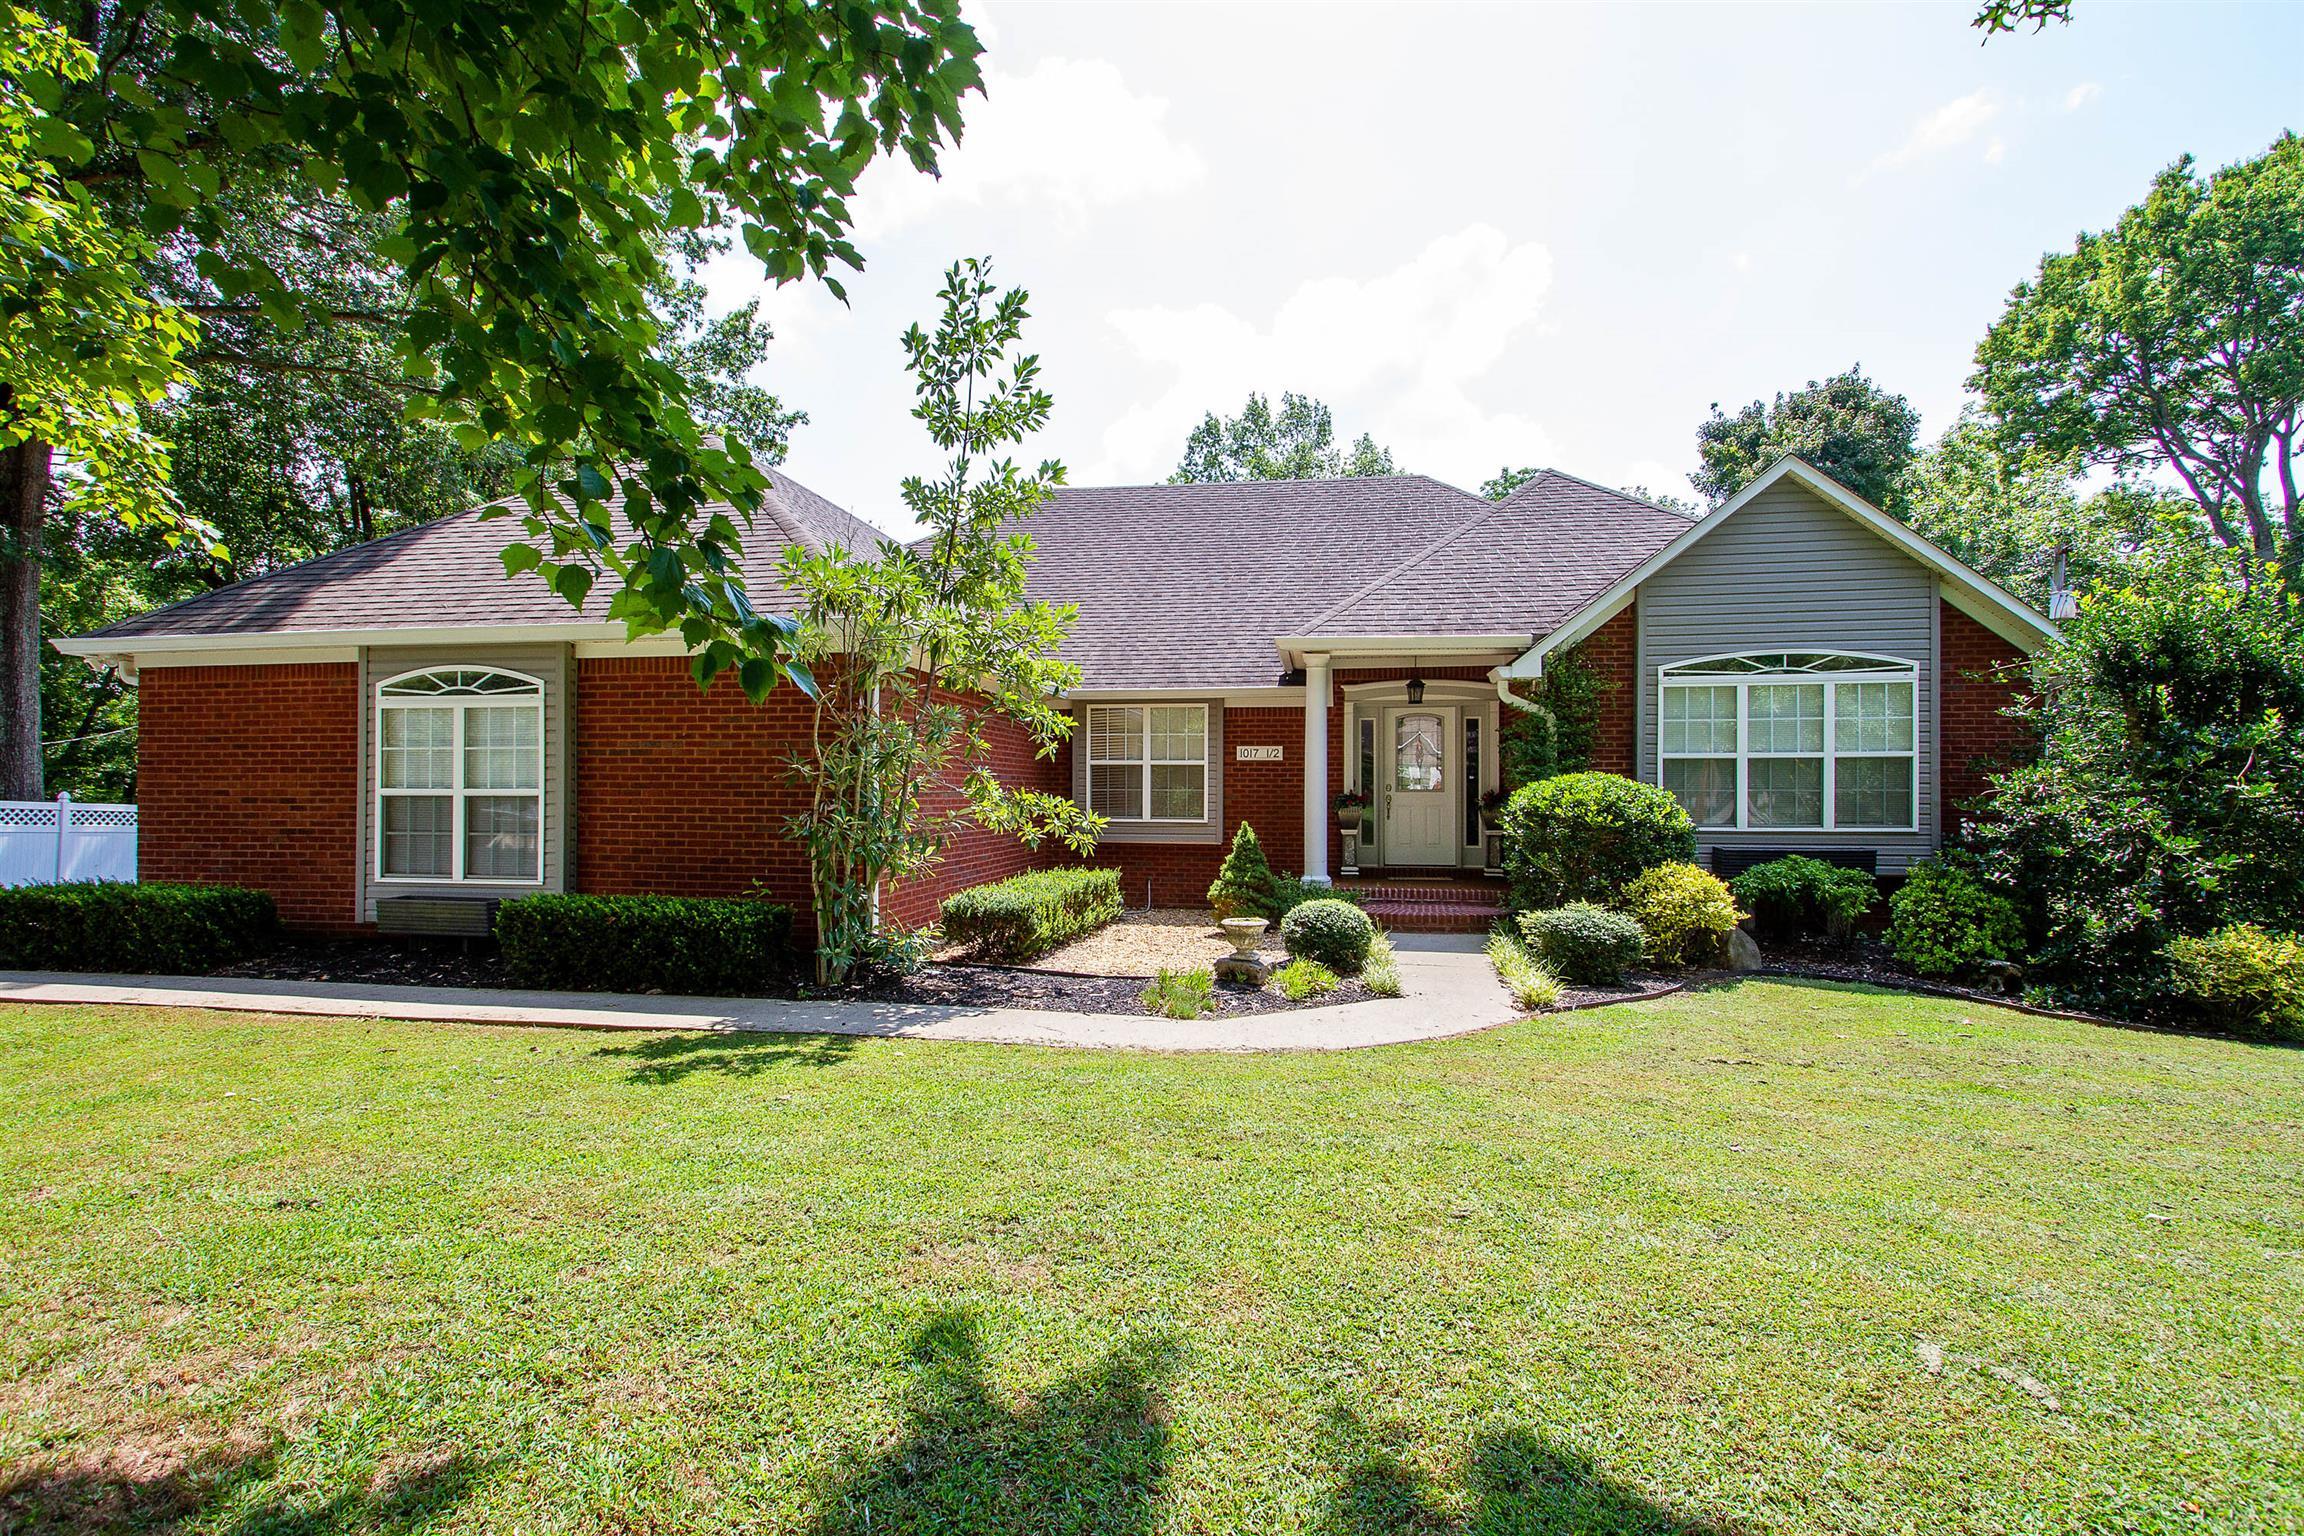 1017.5 Sunnyside Dr, Columbia, TN 38401 - Columbia, TN real estate listing